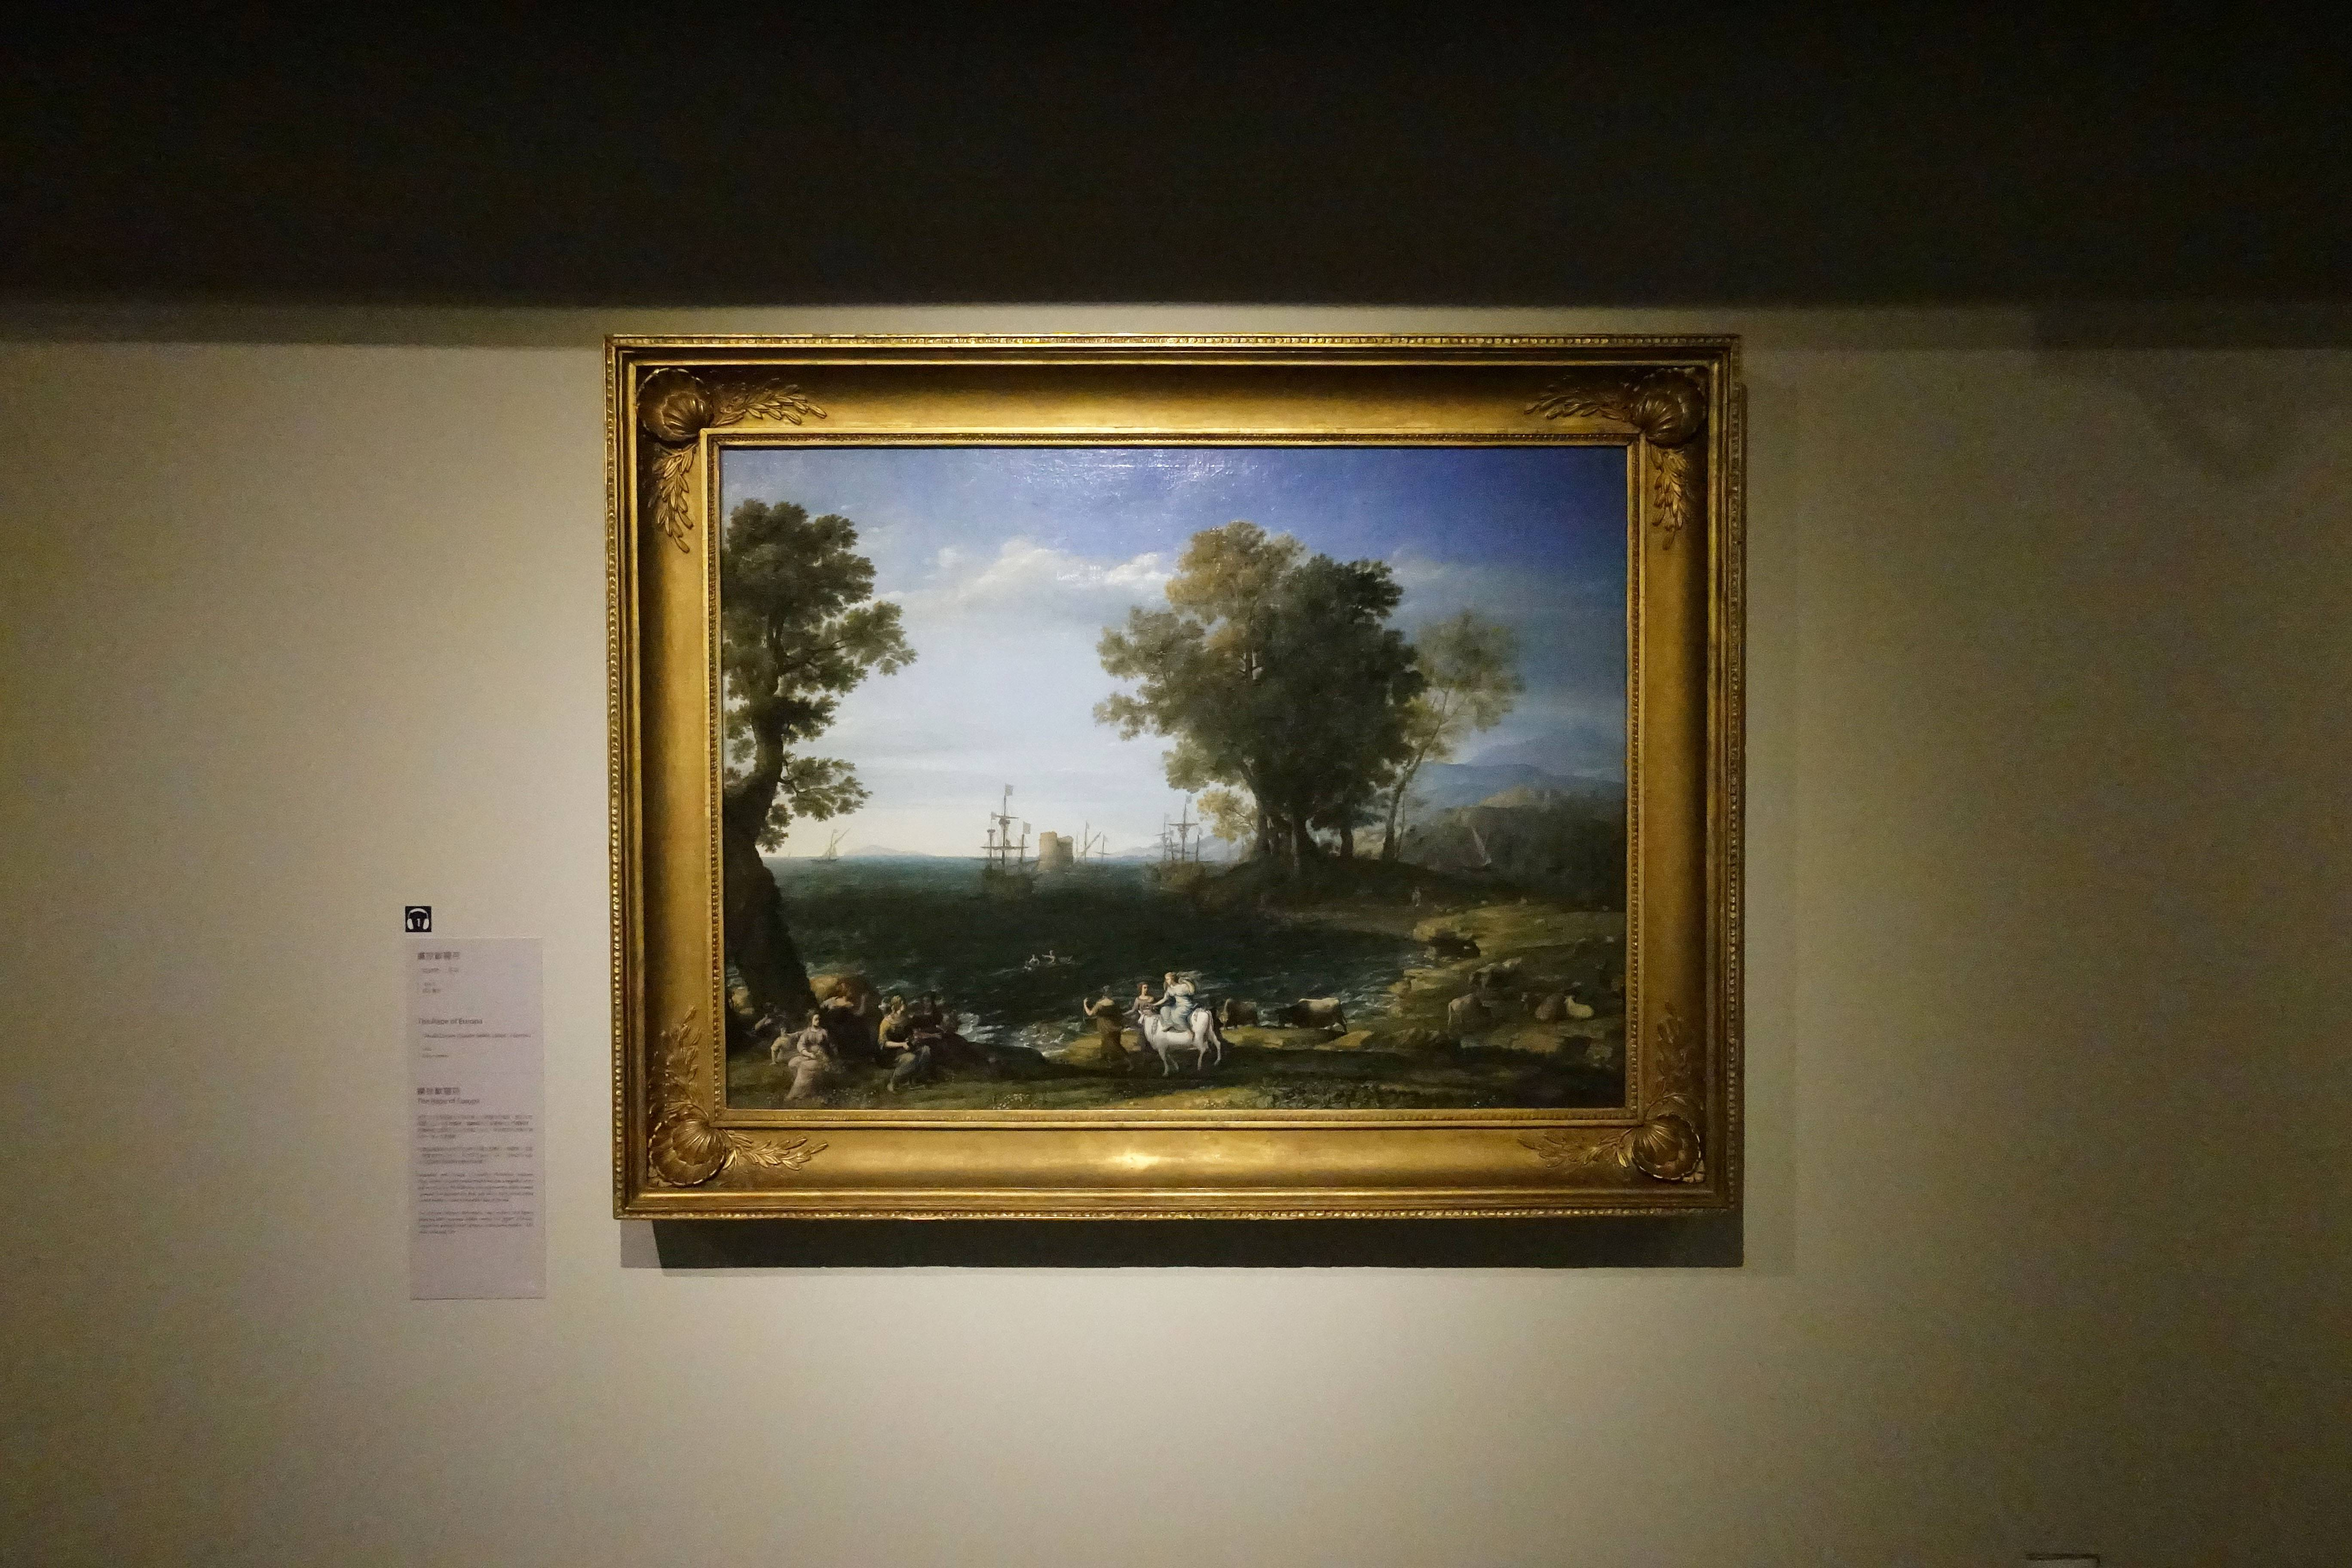 克勞德.洛罕 Claude Lorrain (Claude Gellée, called Le Lorrain) ,《擄掠歐羅芭 The Rape of Europa》,油彩、畫布 Oil on canvas。